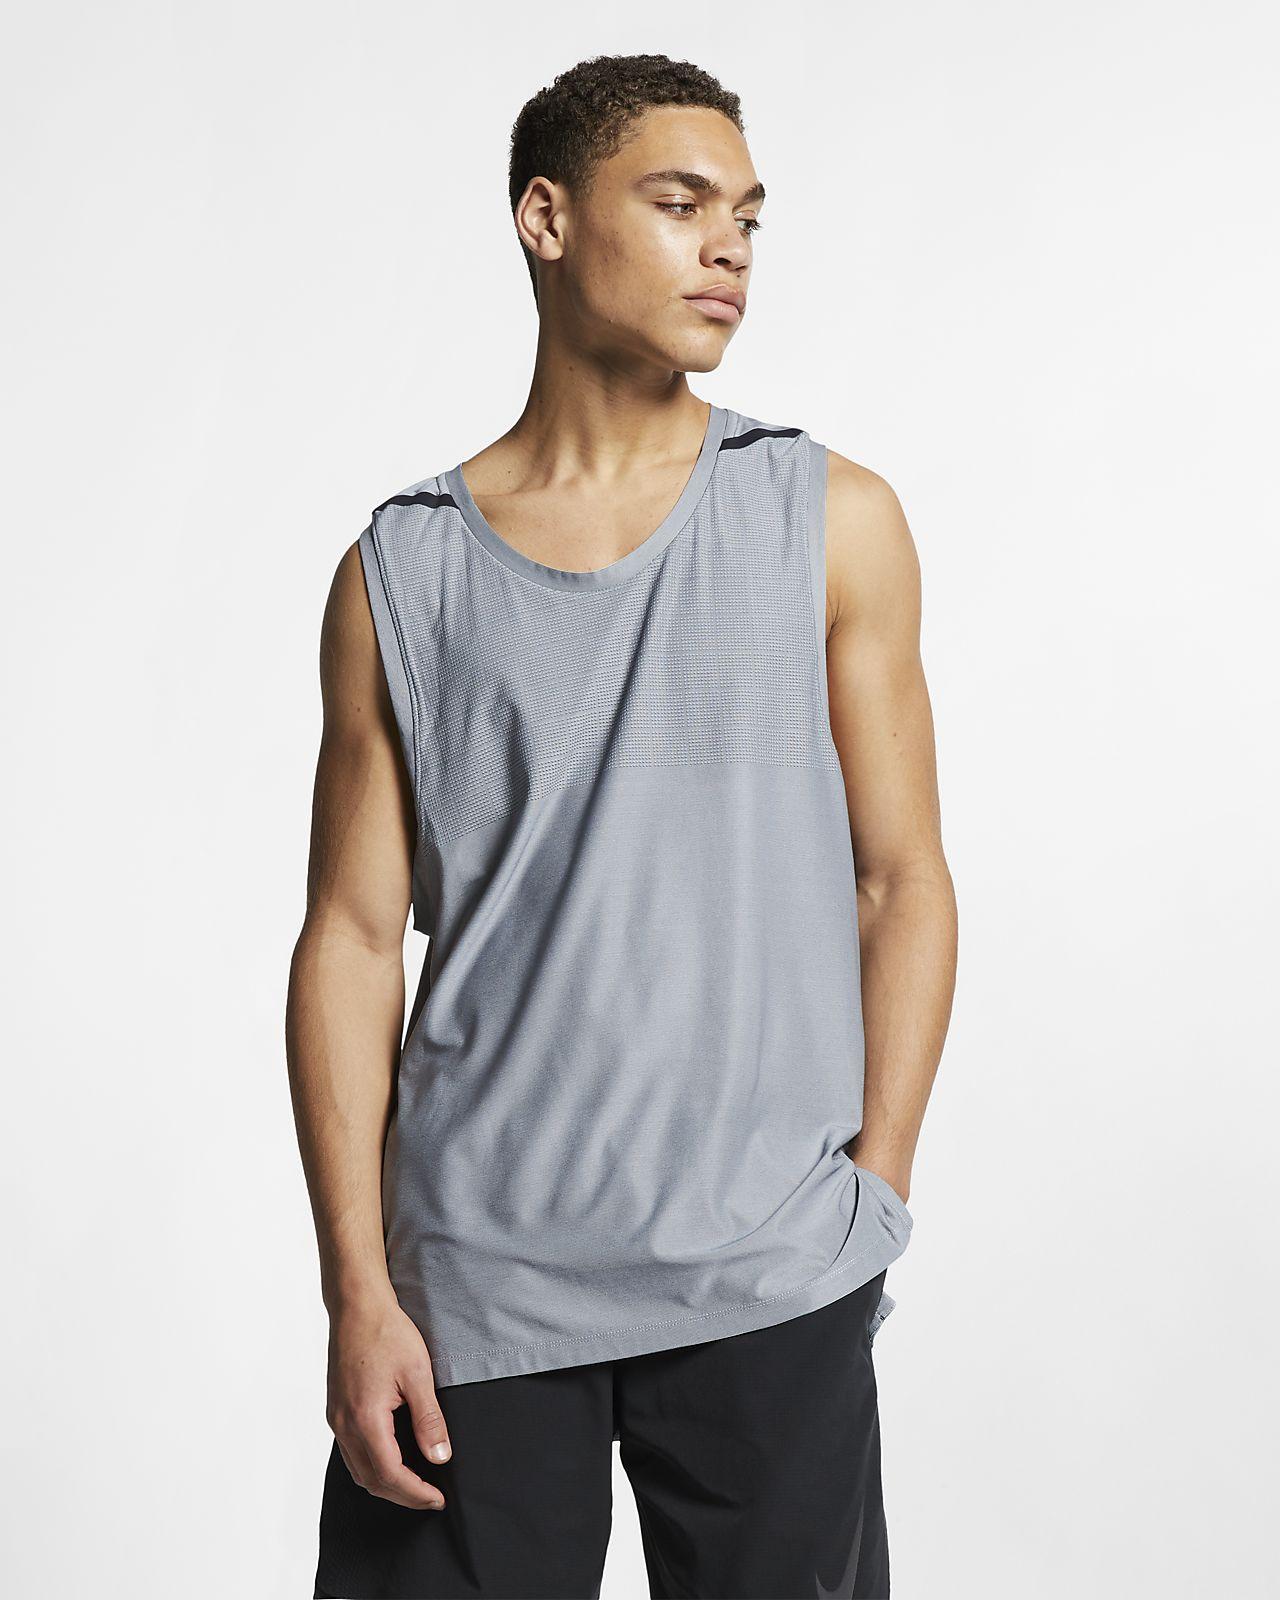 Męska koszulka treningowa bez rękawów Nike Dri-FIT Tech Pack